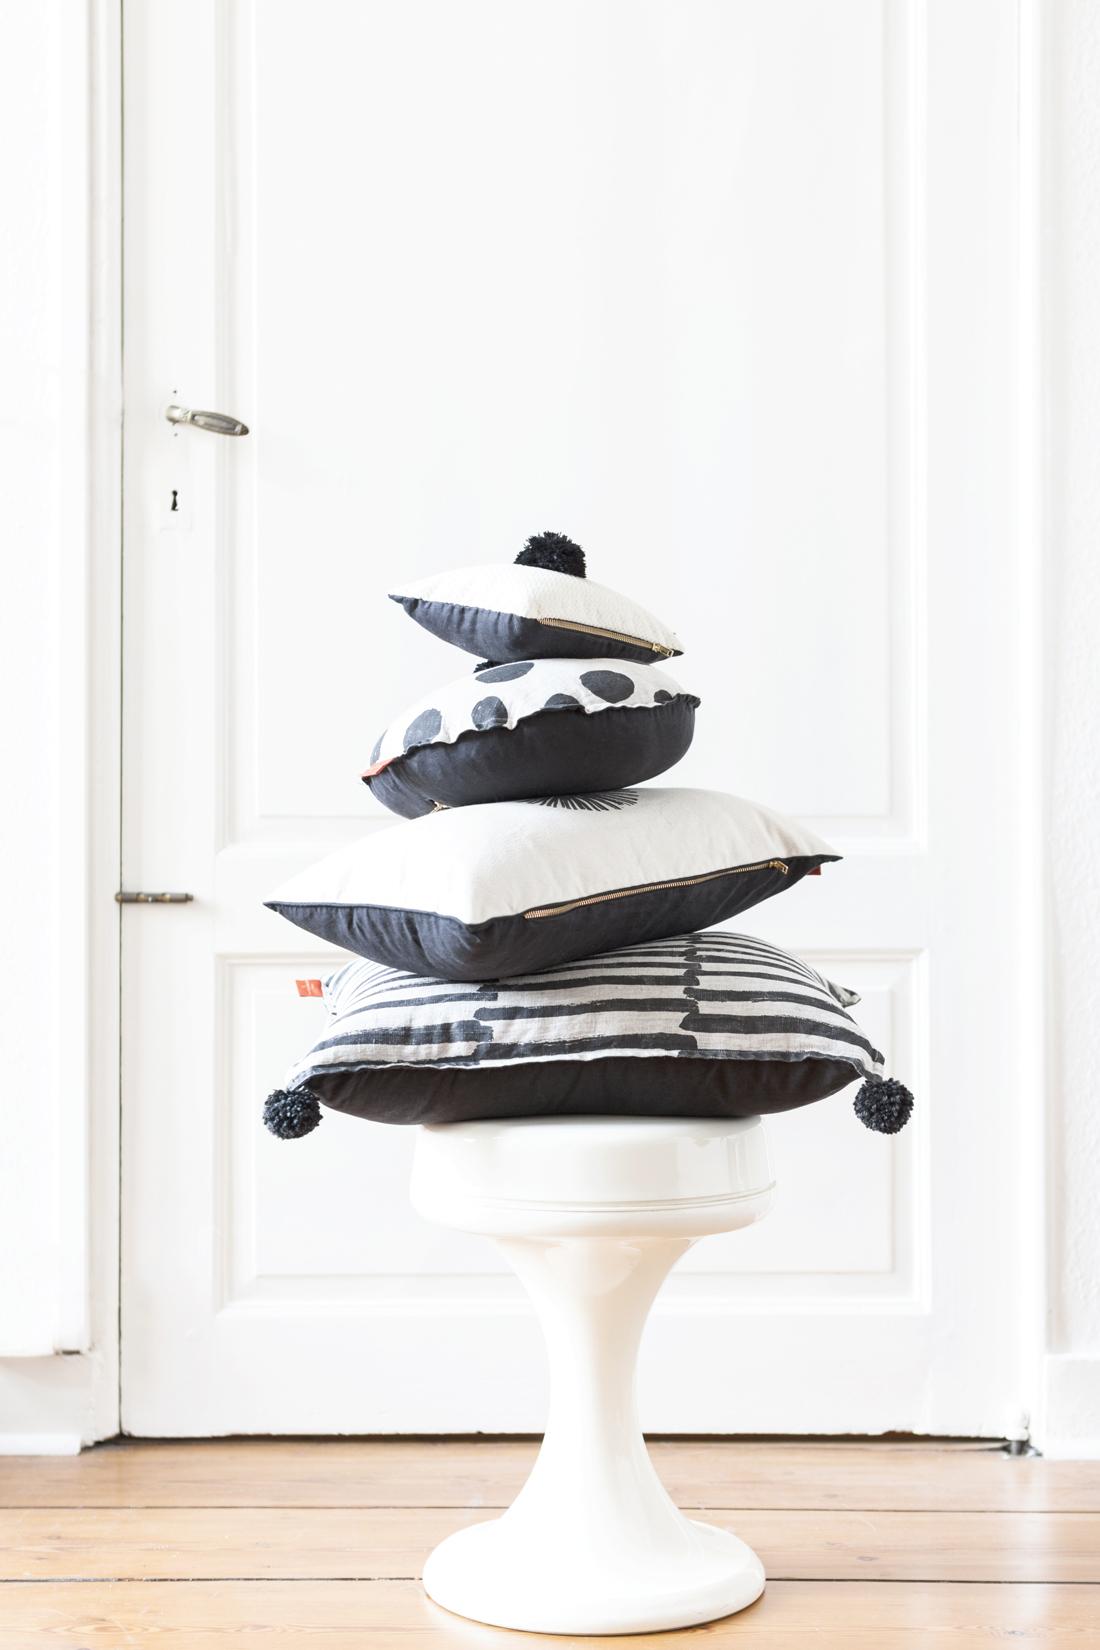 marika giacinti coussins decoratifs et objets porcelaine chiara stella home 4